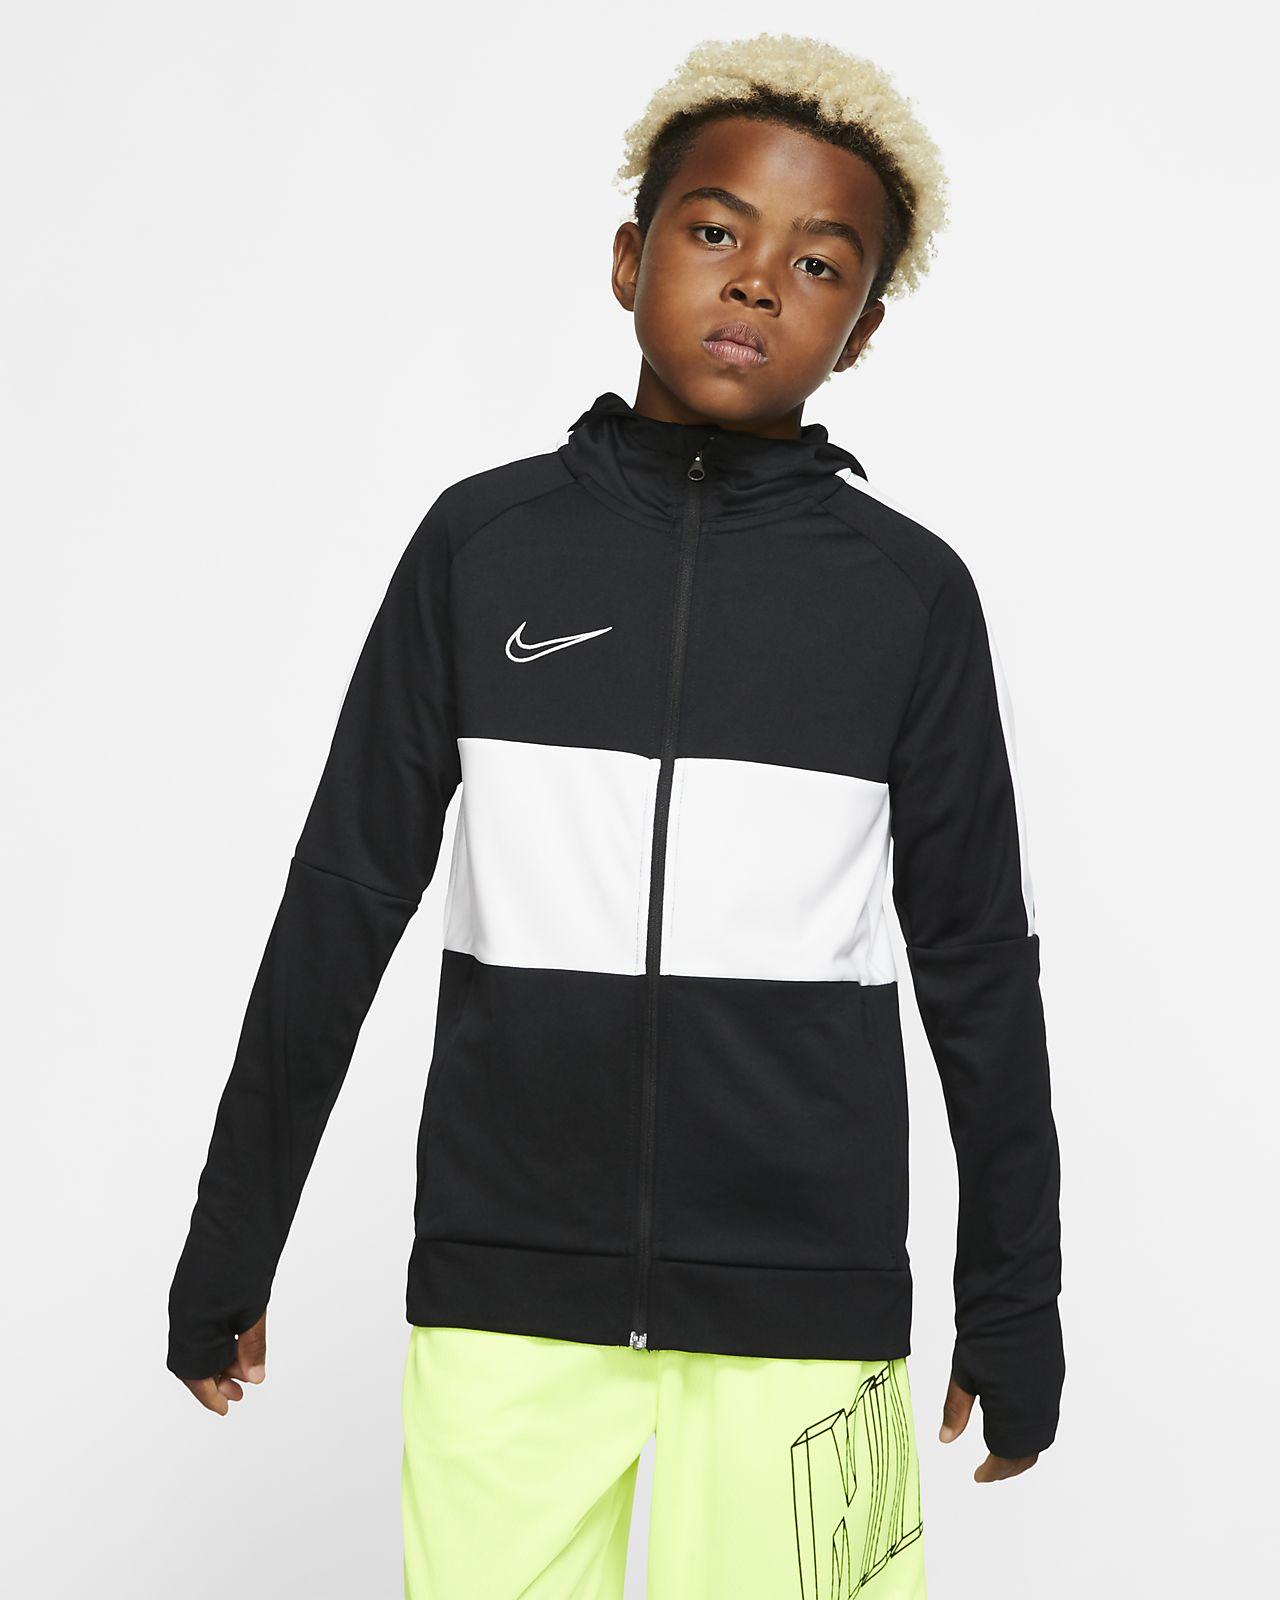 Nike Dri FIT Academy Fußballjacke für ältere Kinder